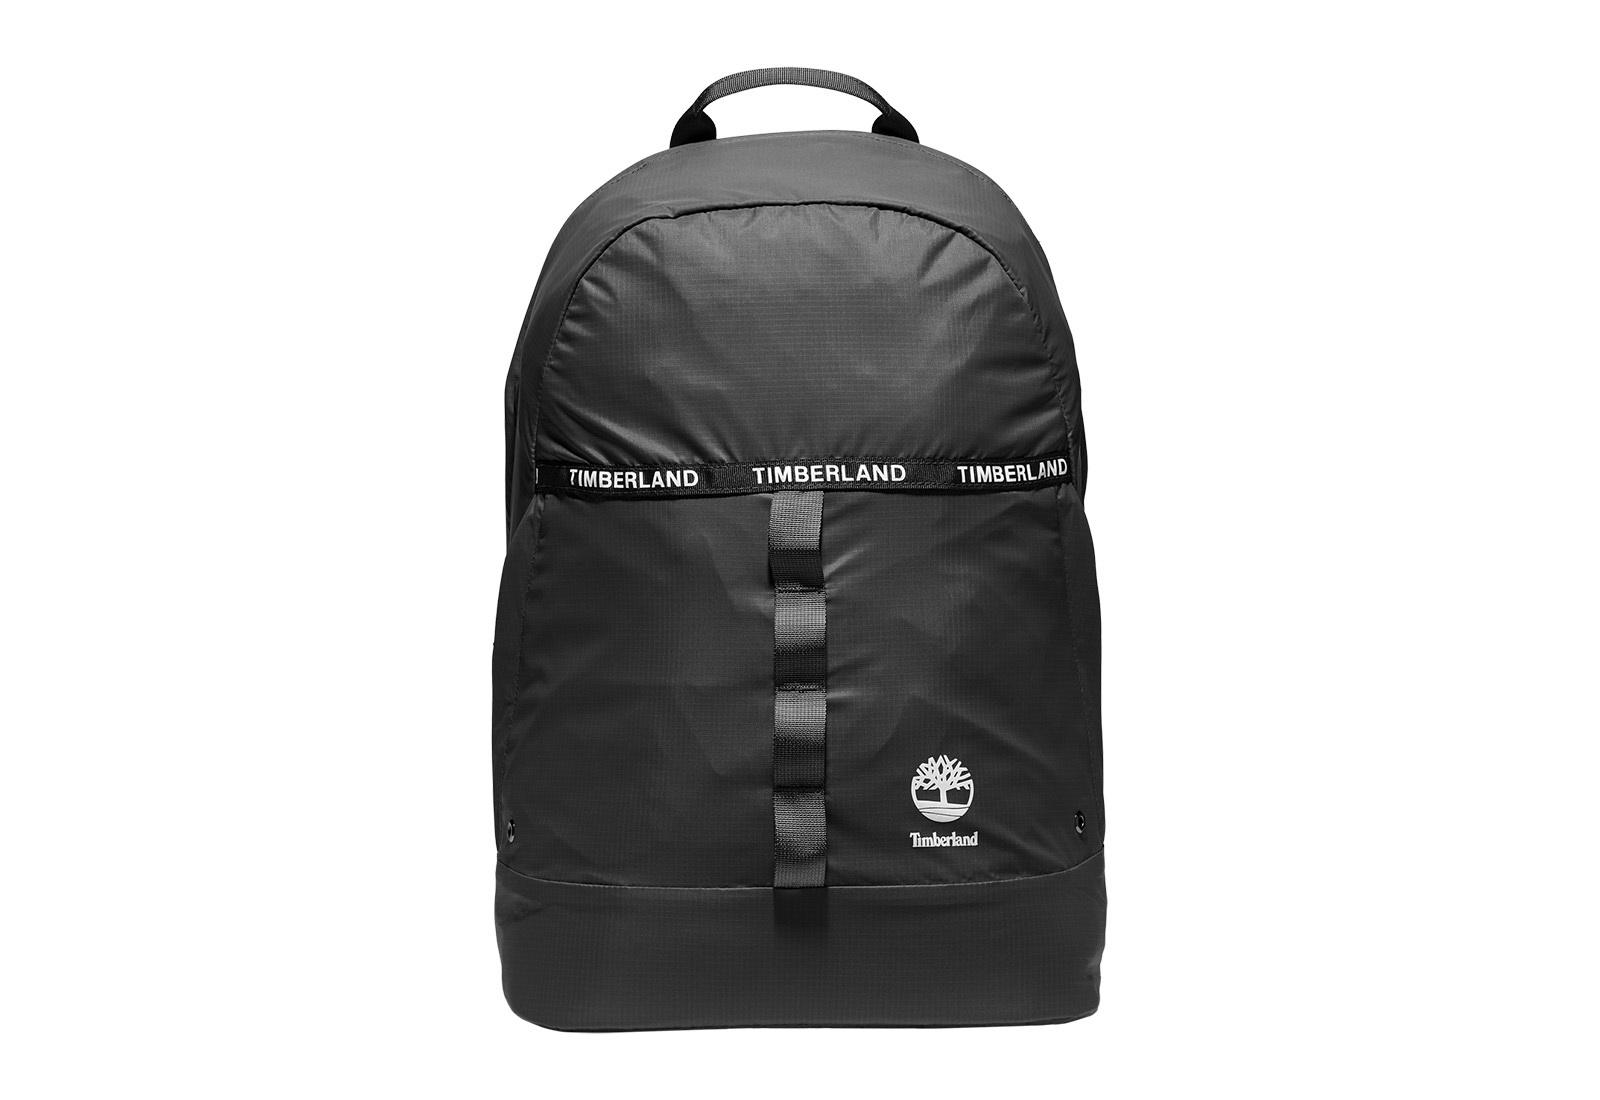 Timberland torba Classic Backpack